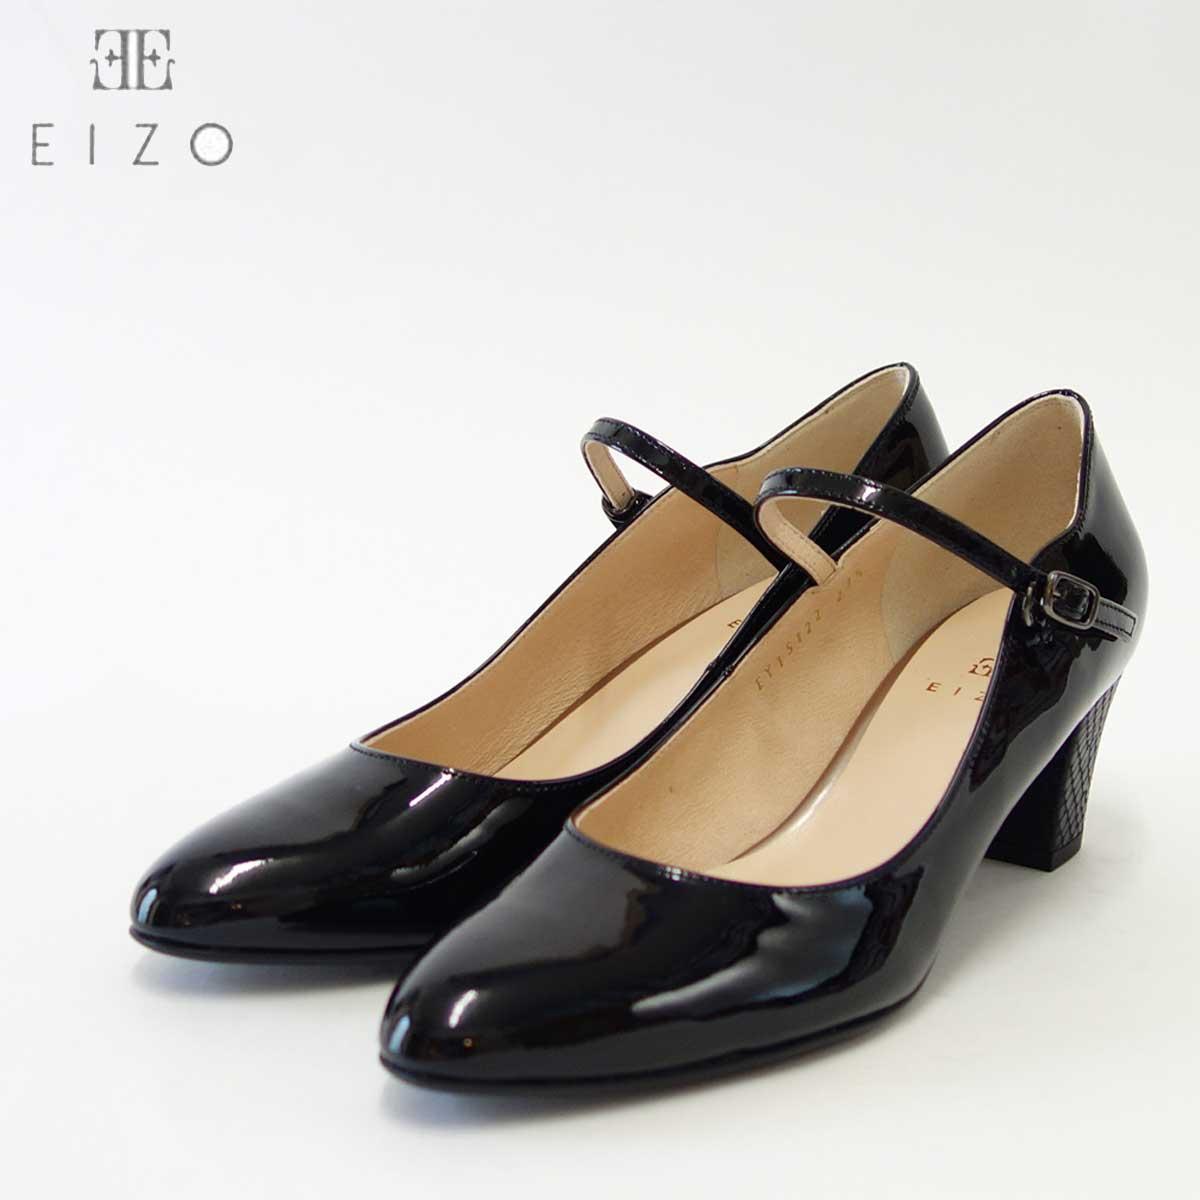 EIZO エイゾー 15122 ブラックエナメル上質レザーのアンクルストラップパンプス「靴」